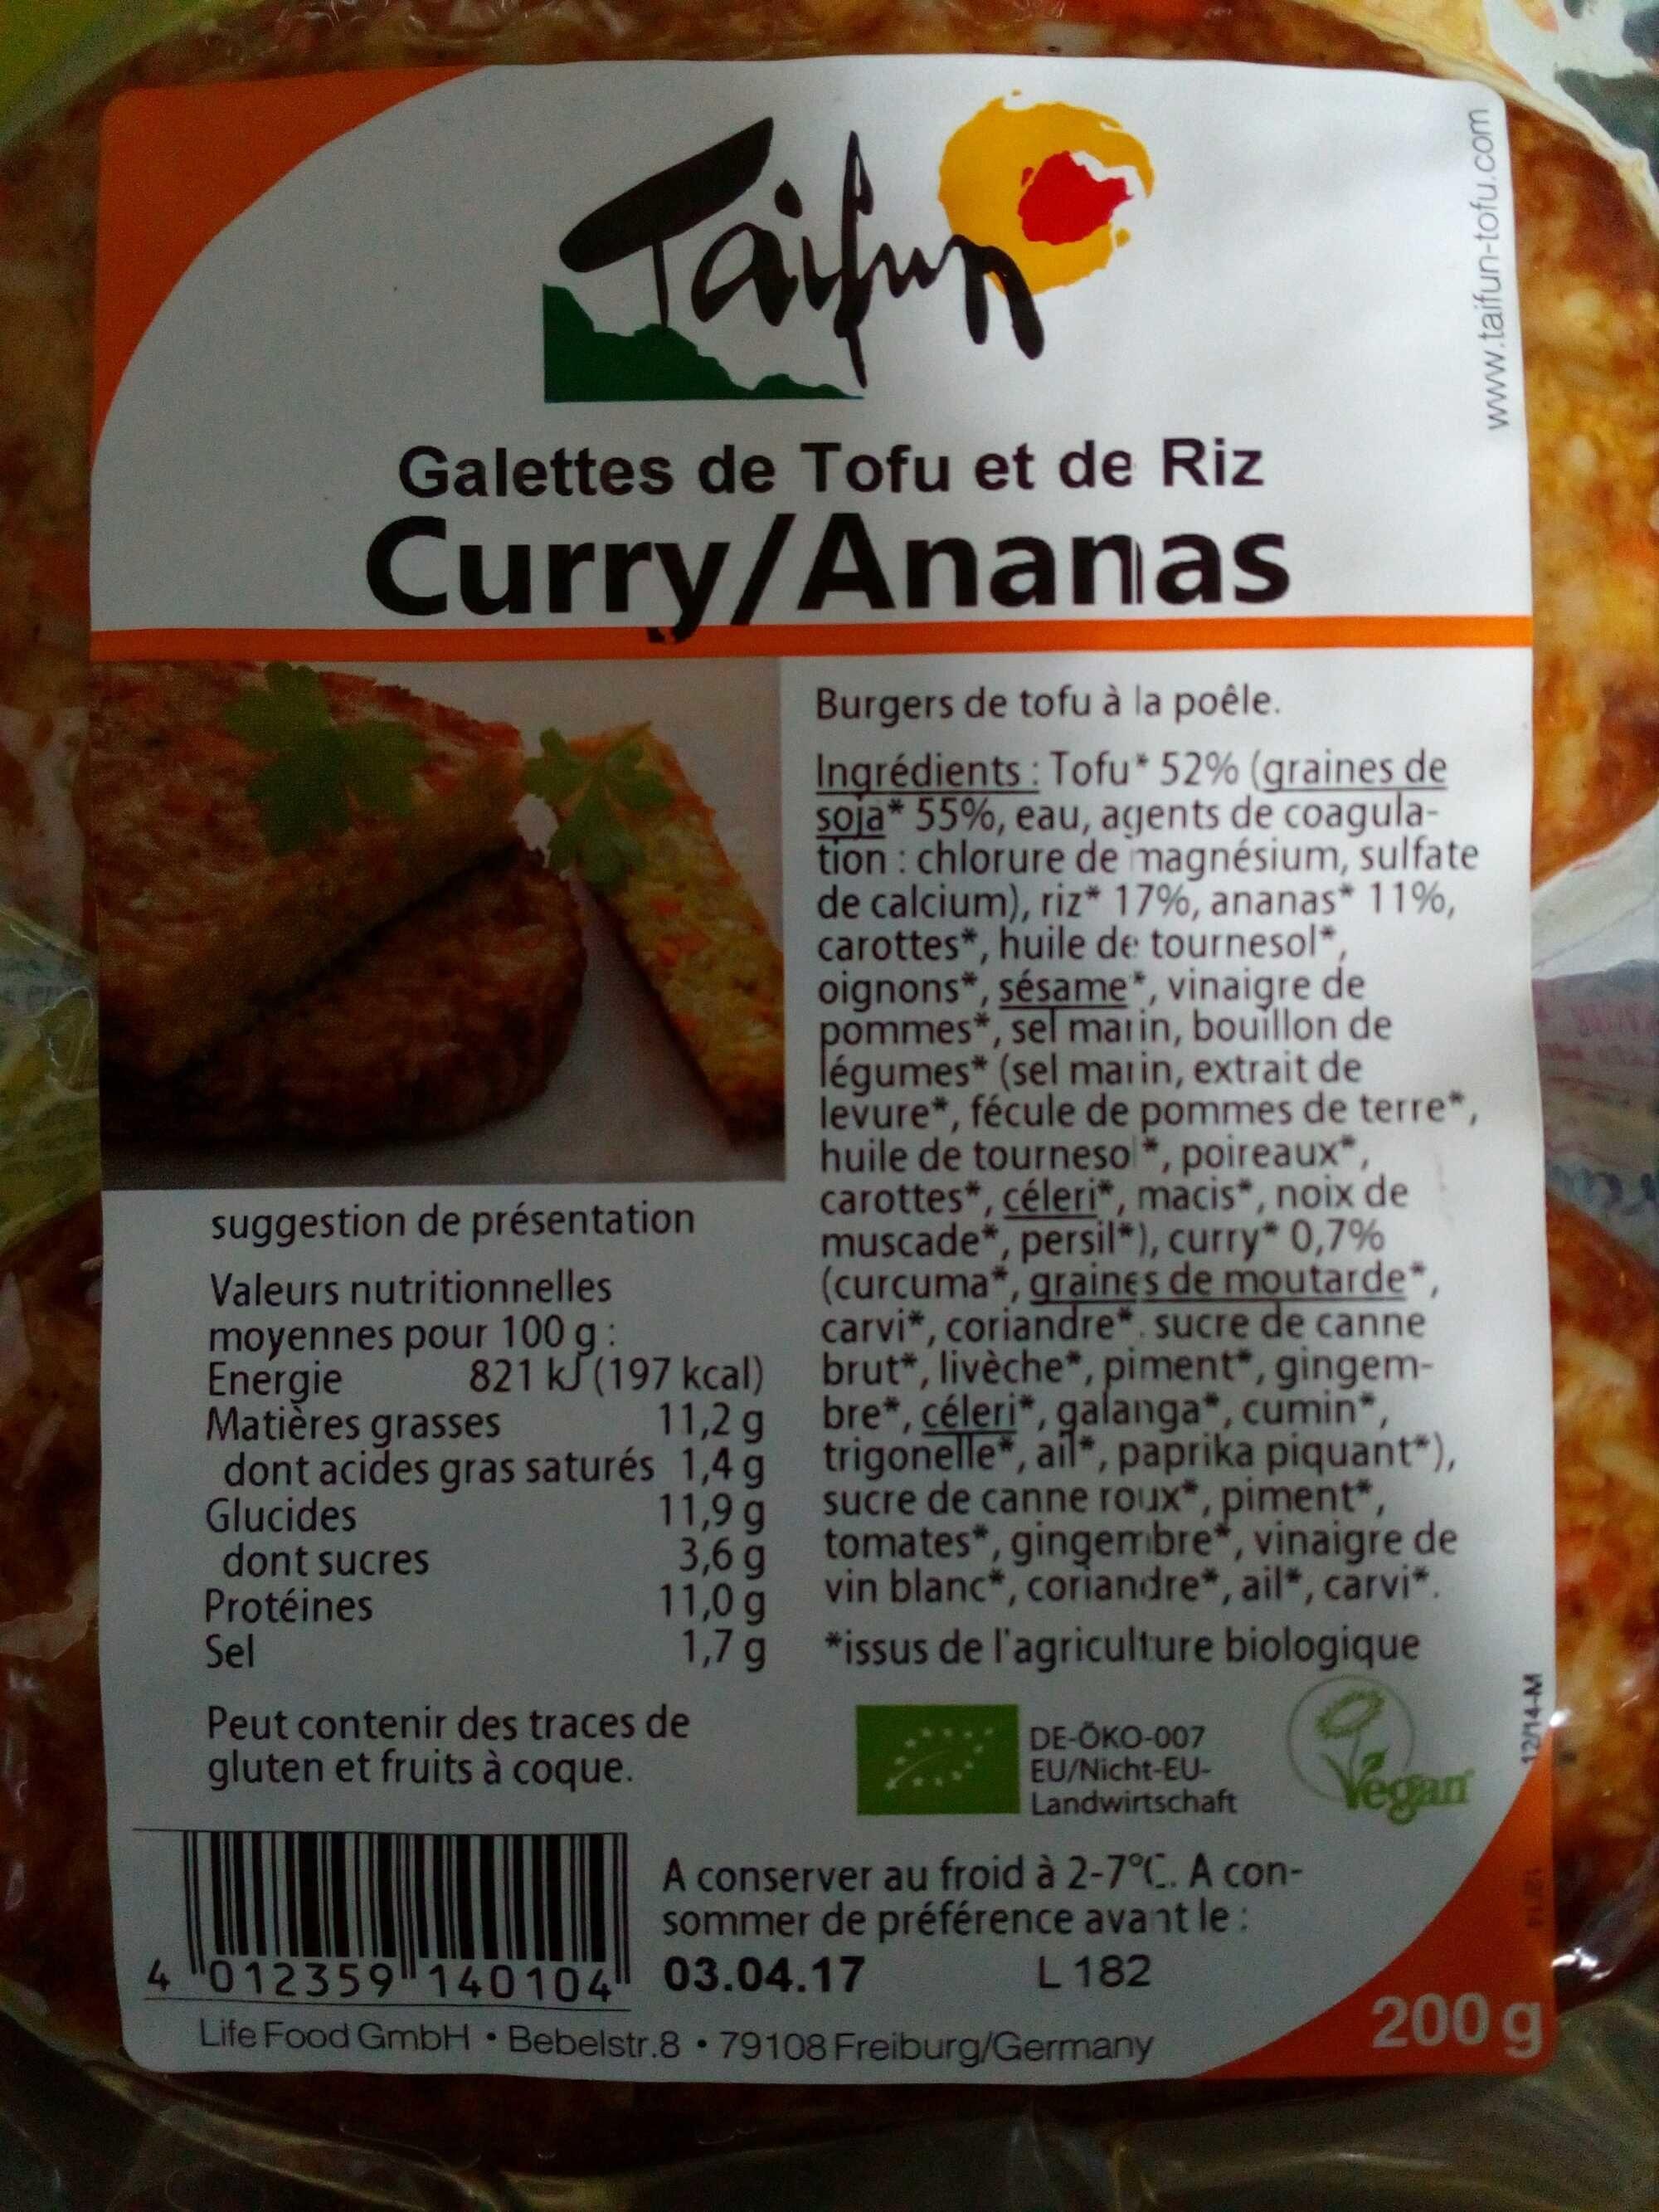 Galettes de tofu et de riz curry/ ananas - Produit - fr